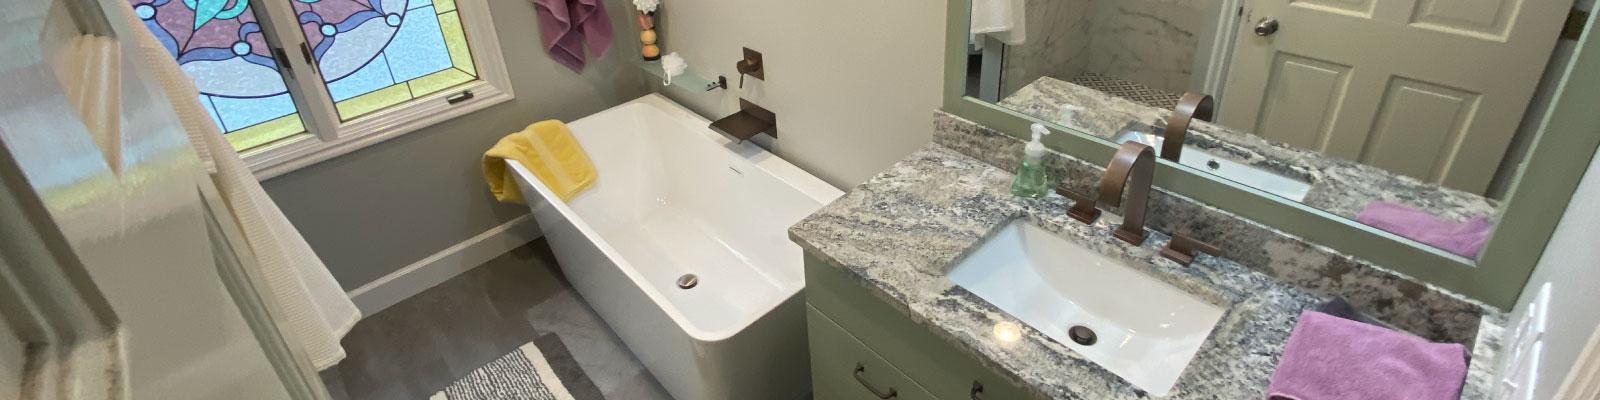 St. Louis 3 Day Kitchen U0026 Bath Remodeling